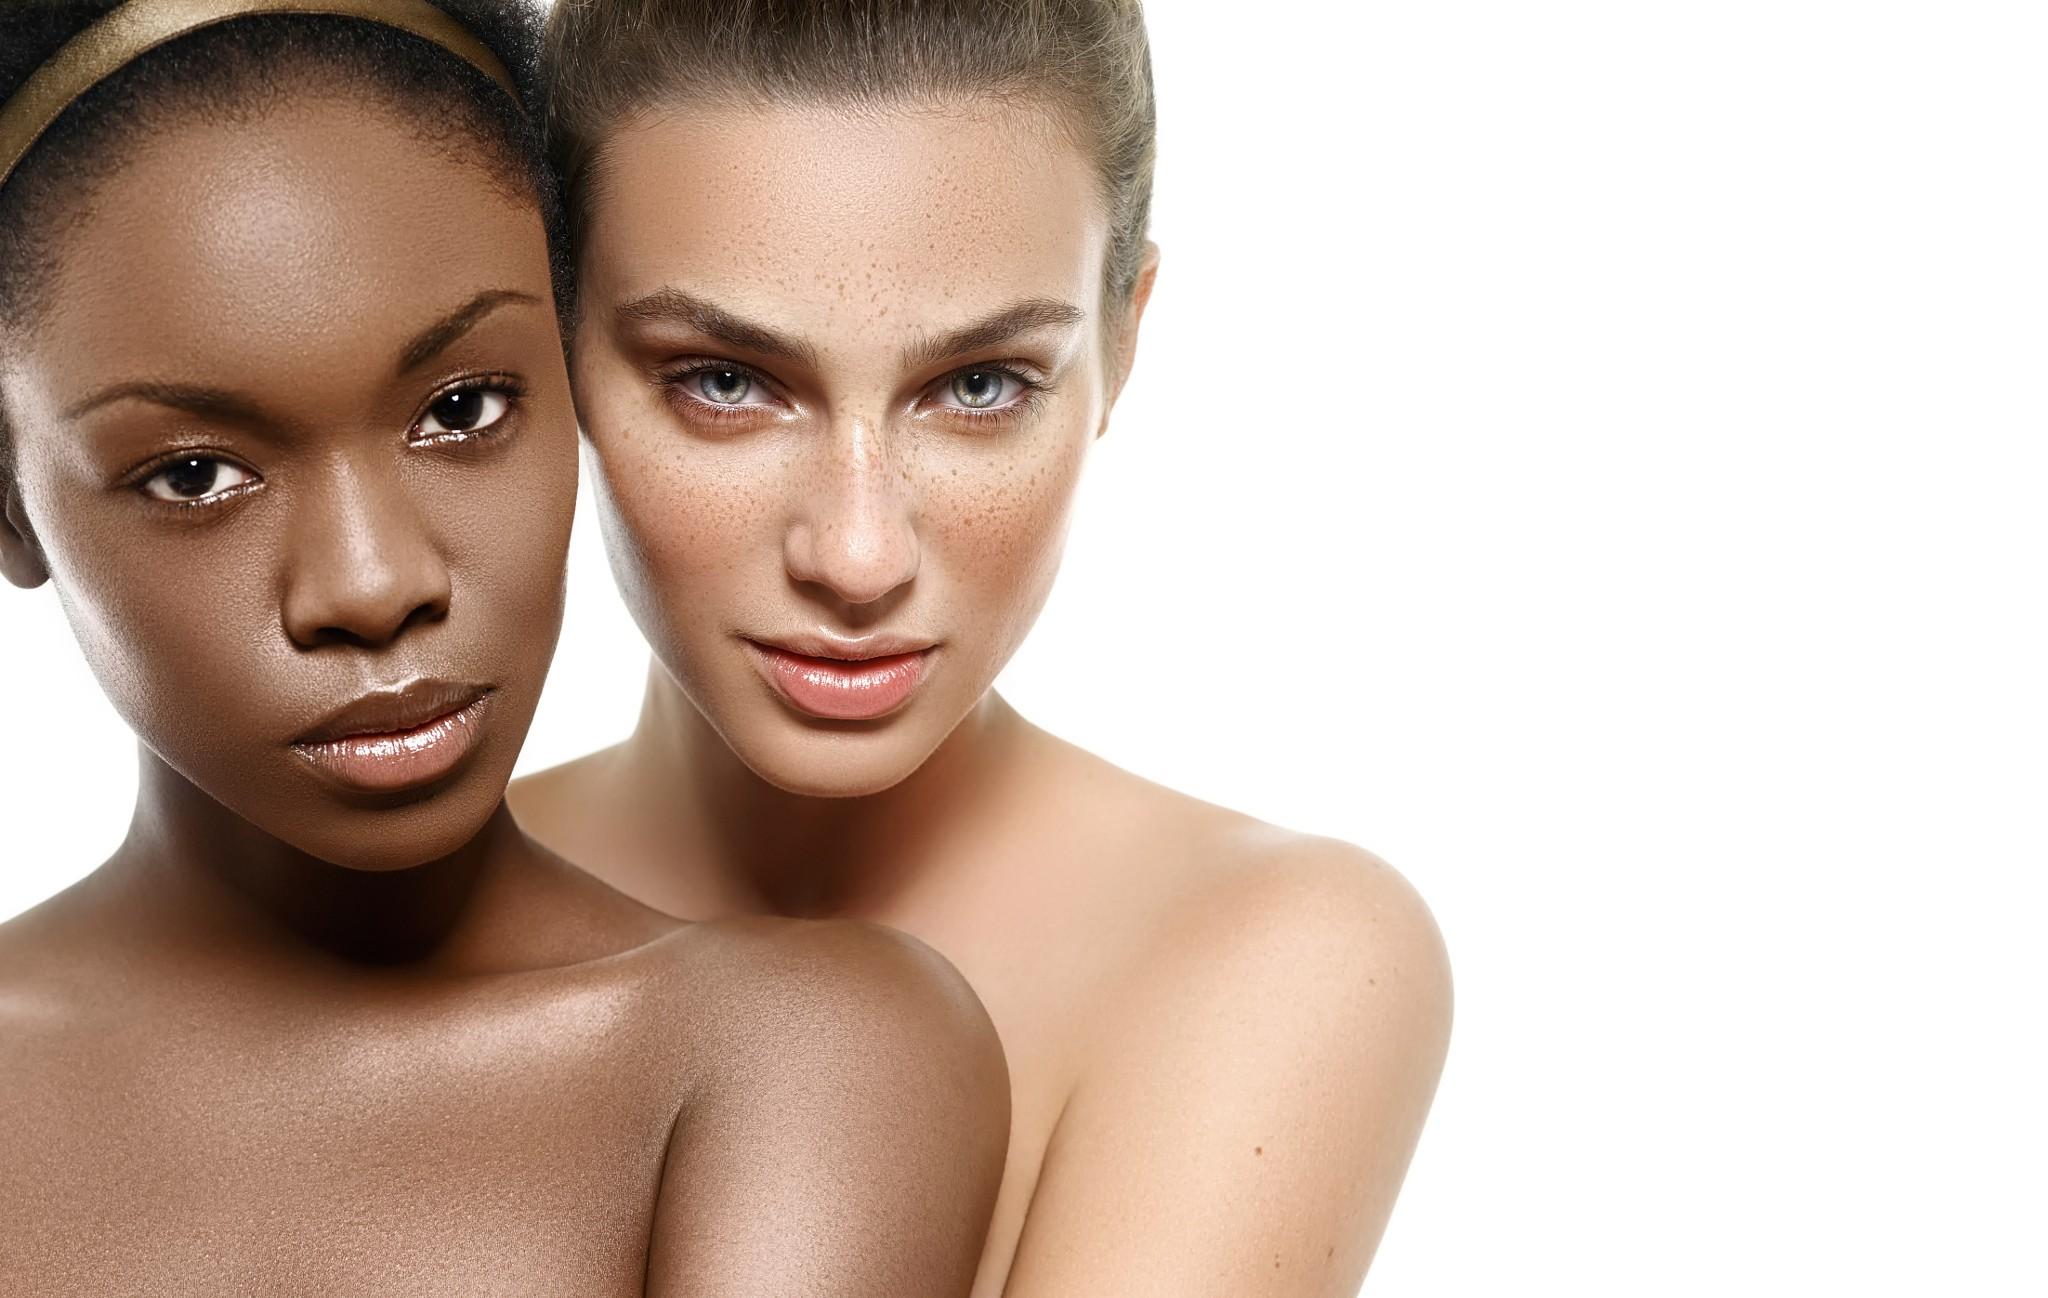 People 2048x1298 model women ebony freckles bare shoulders white background brown eyes blue eyes two women juicy lips looking at viewer